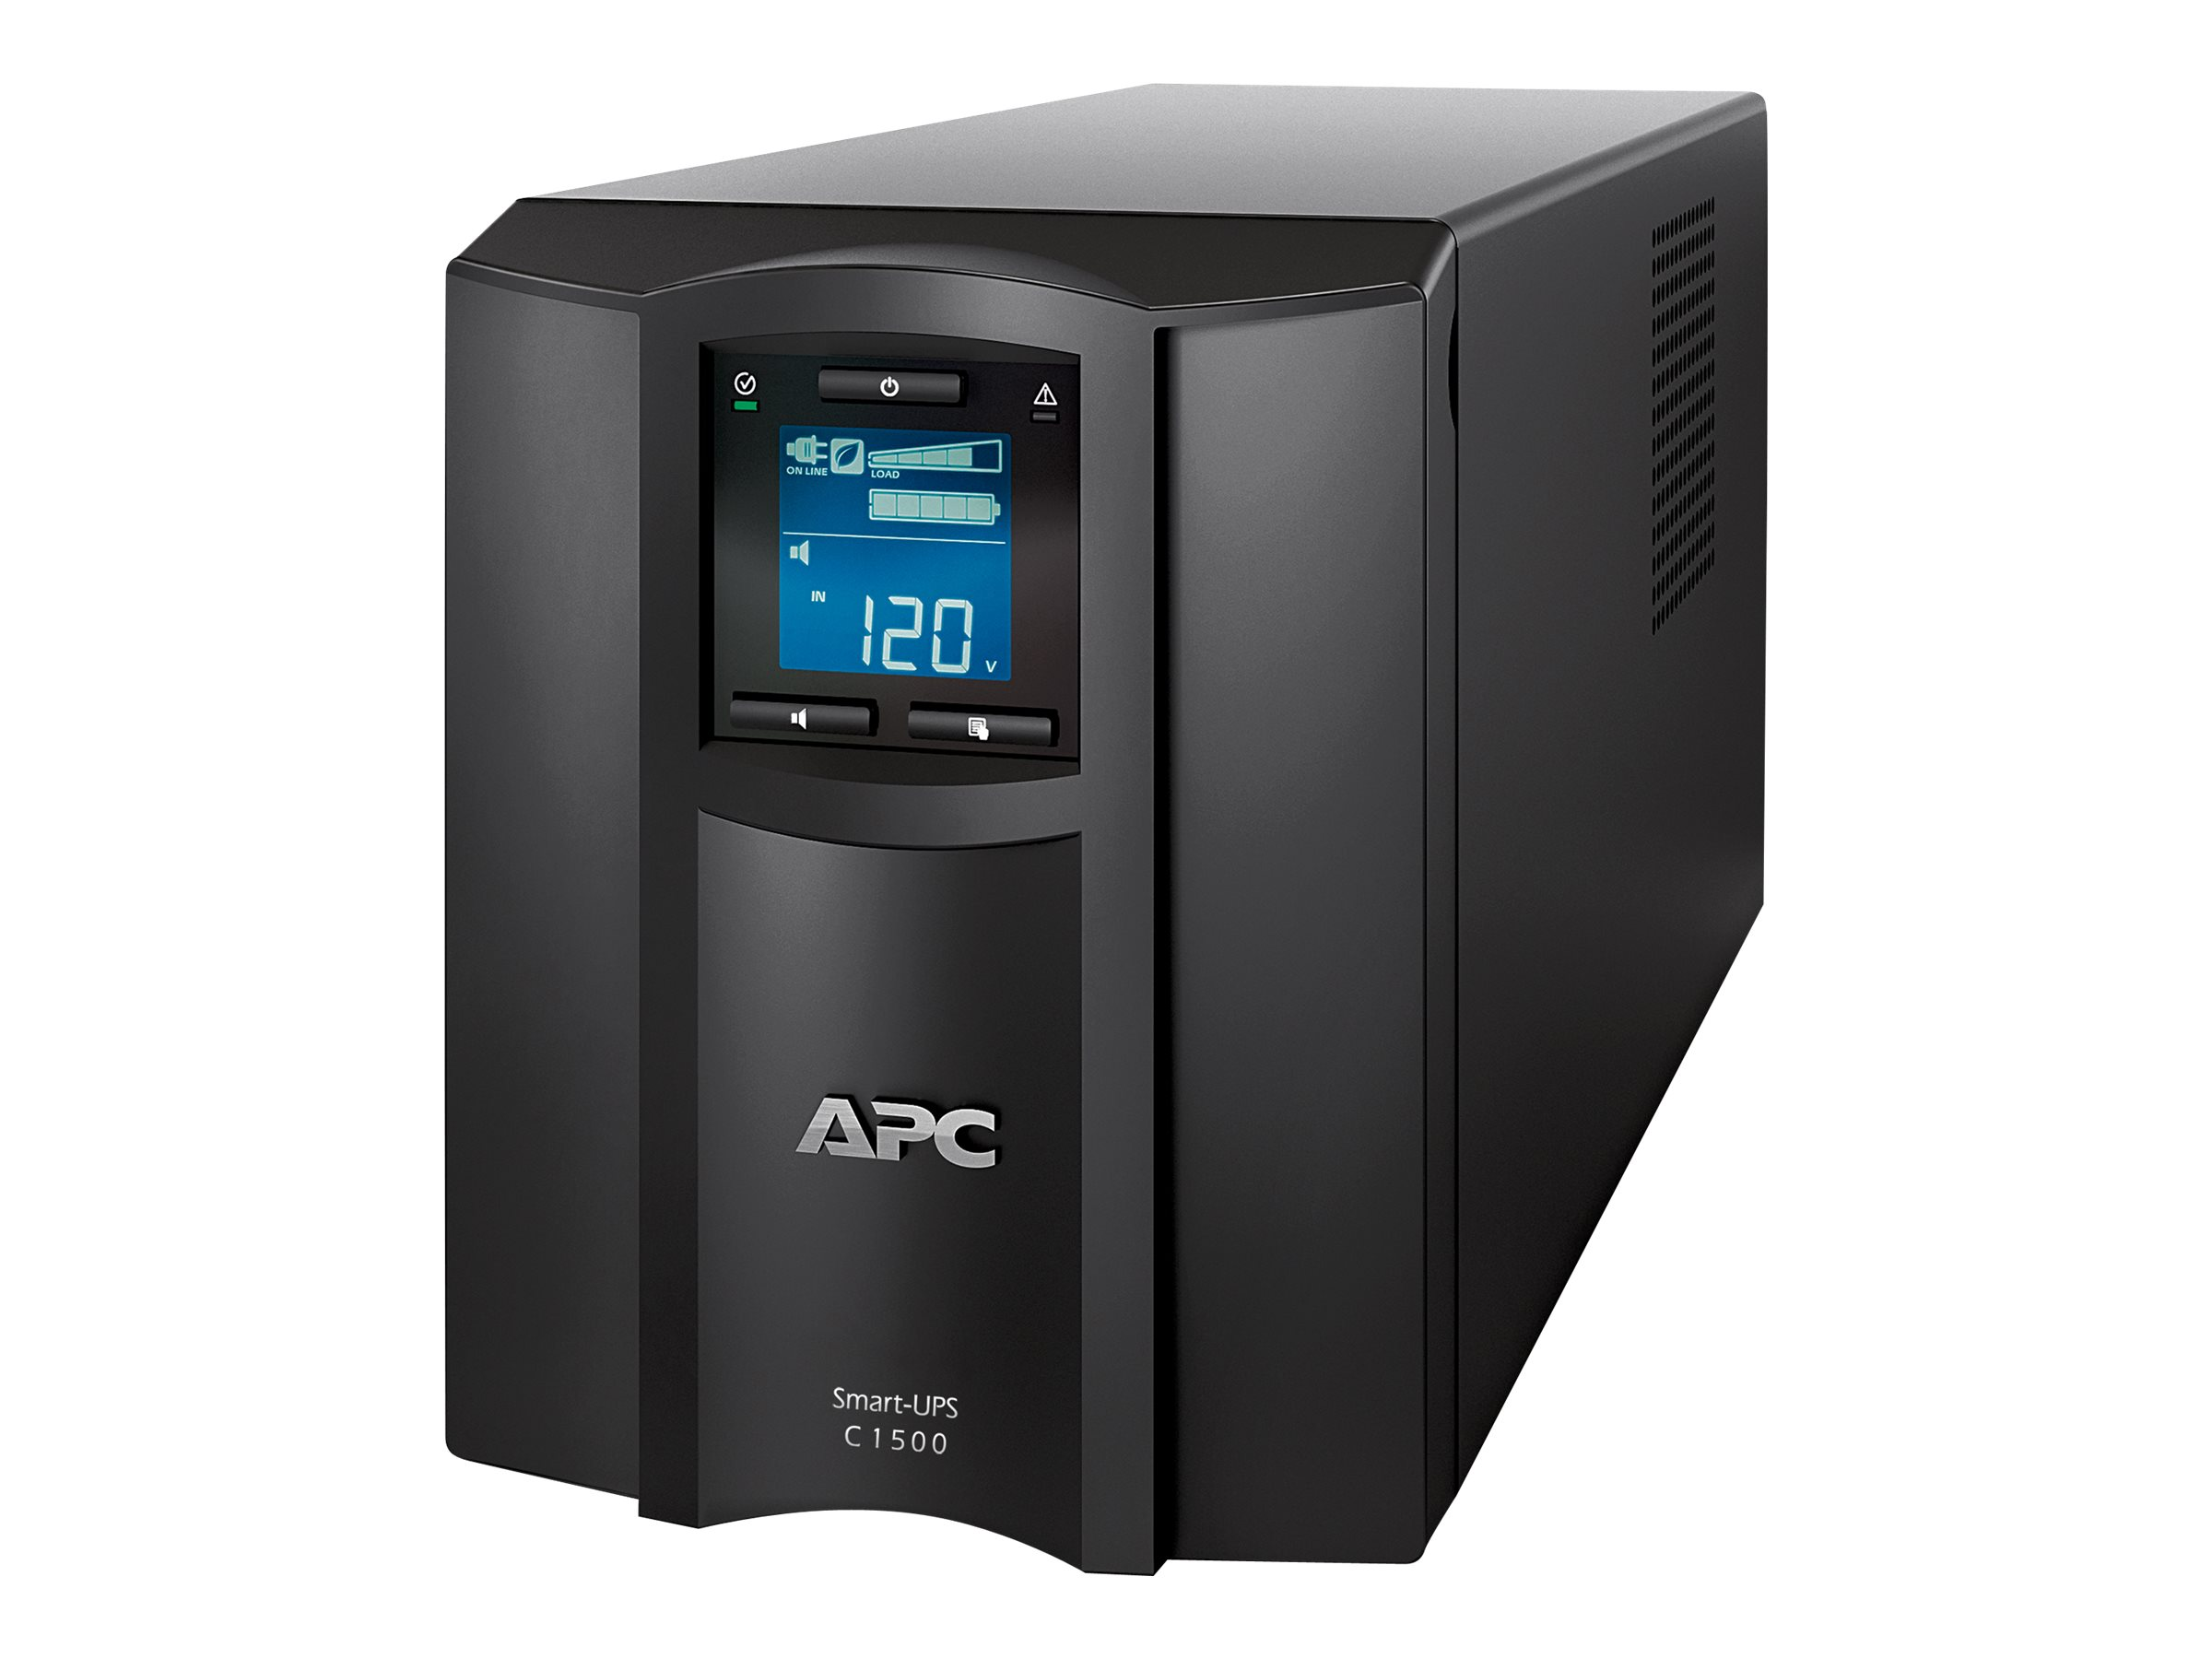 APC Smart-UPS C SMC1500C - UPS - 900 Watt - 1440 VA - with APC SmartConnect